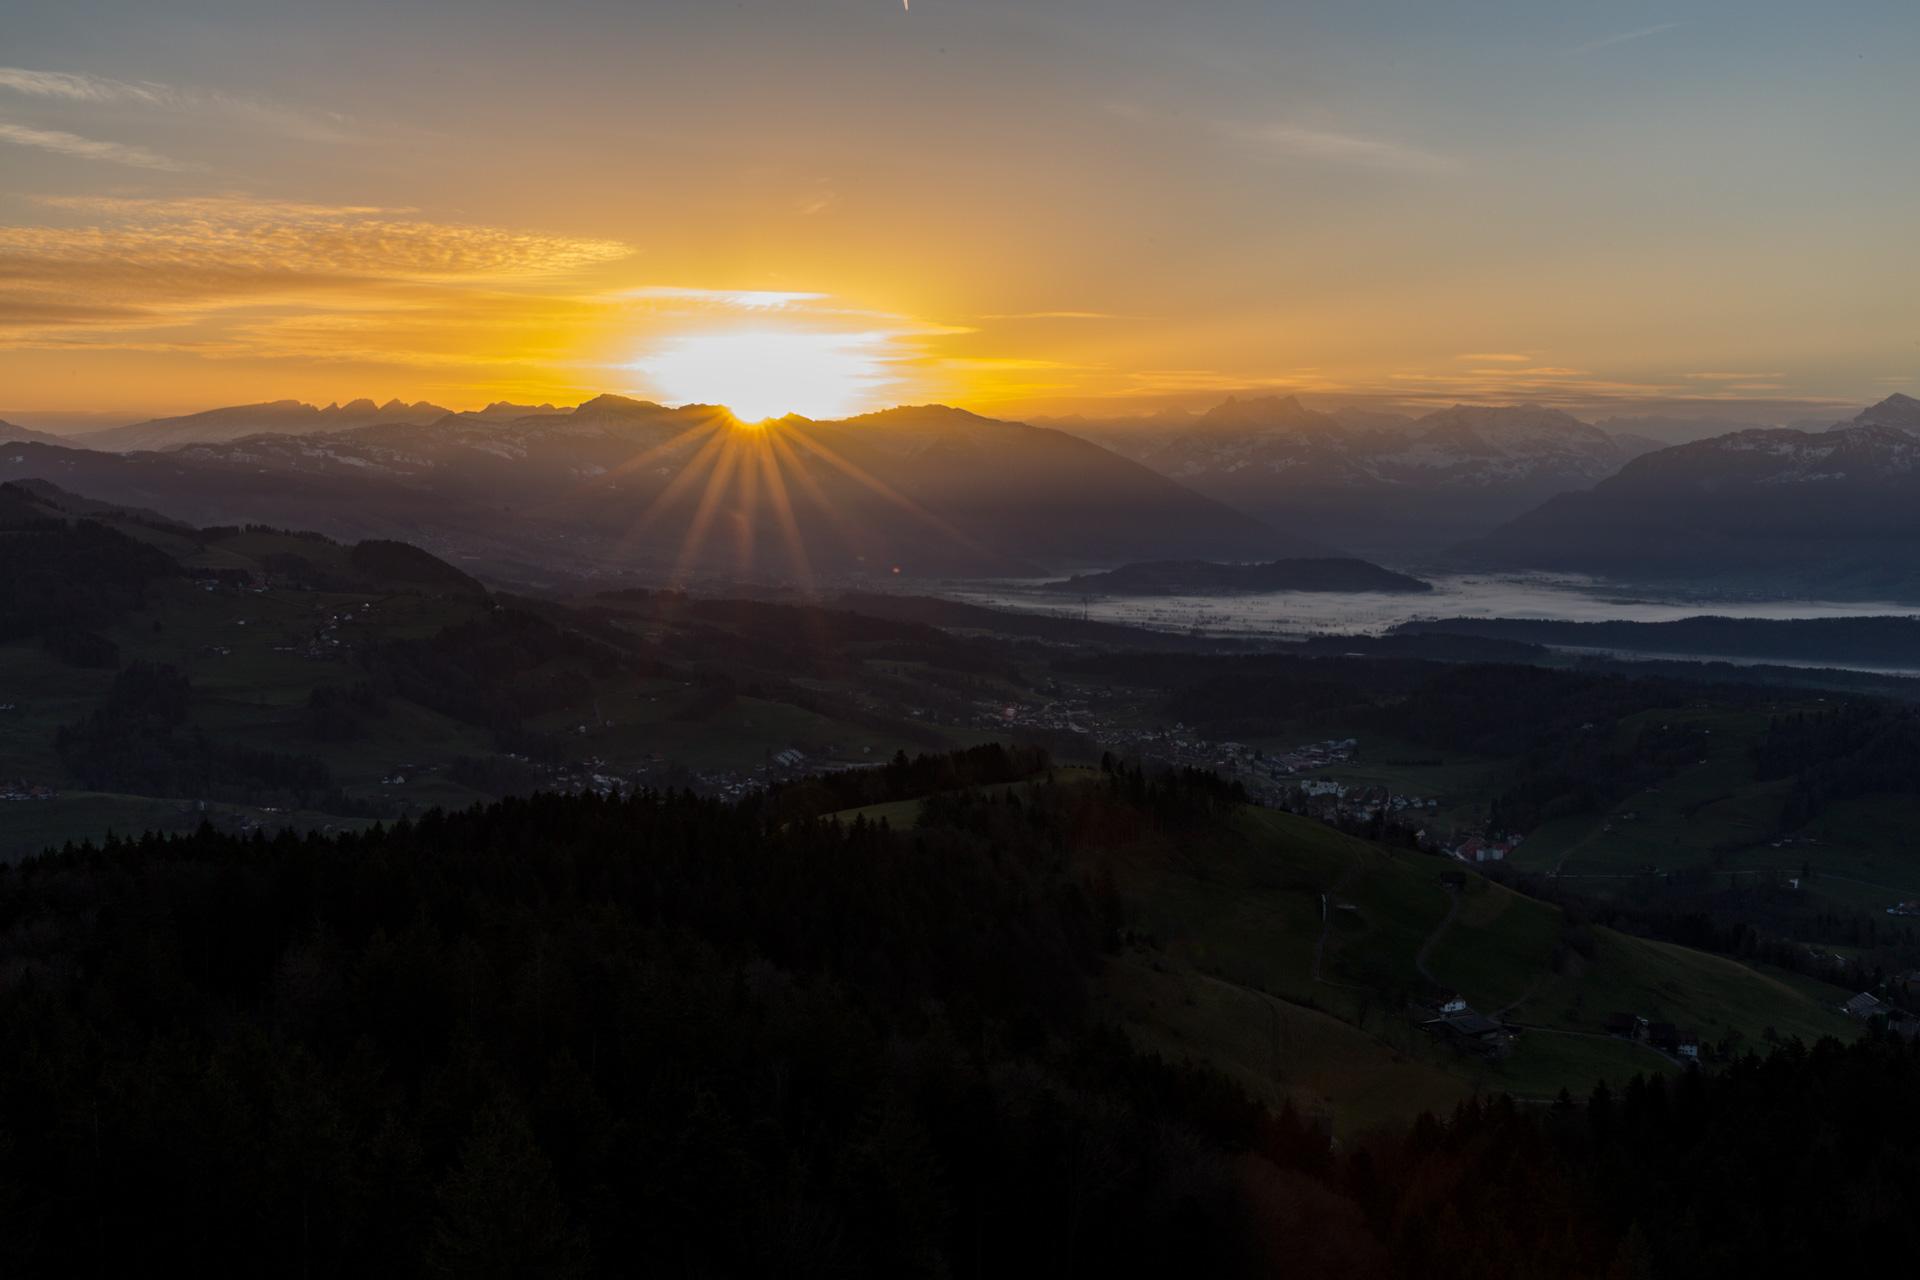 Sonnenaufgang-Bachtelturm_20151219_5950-1ebene